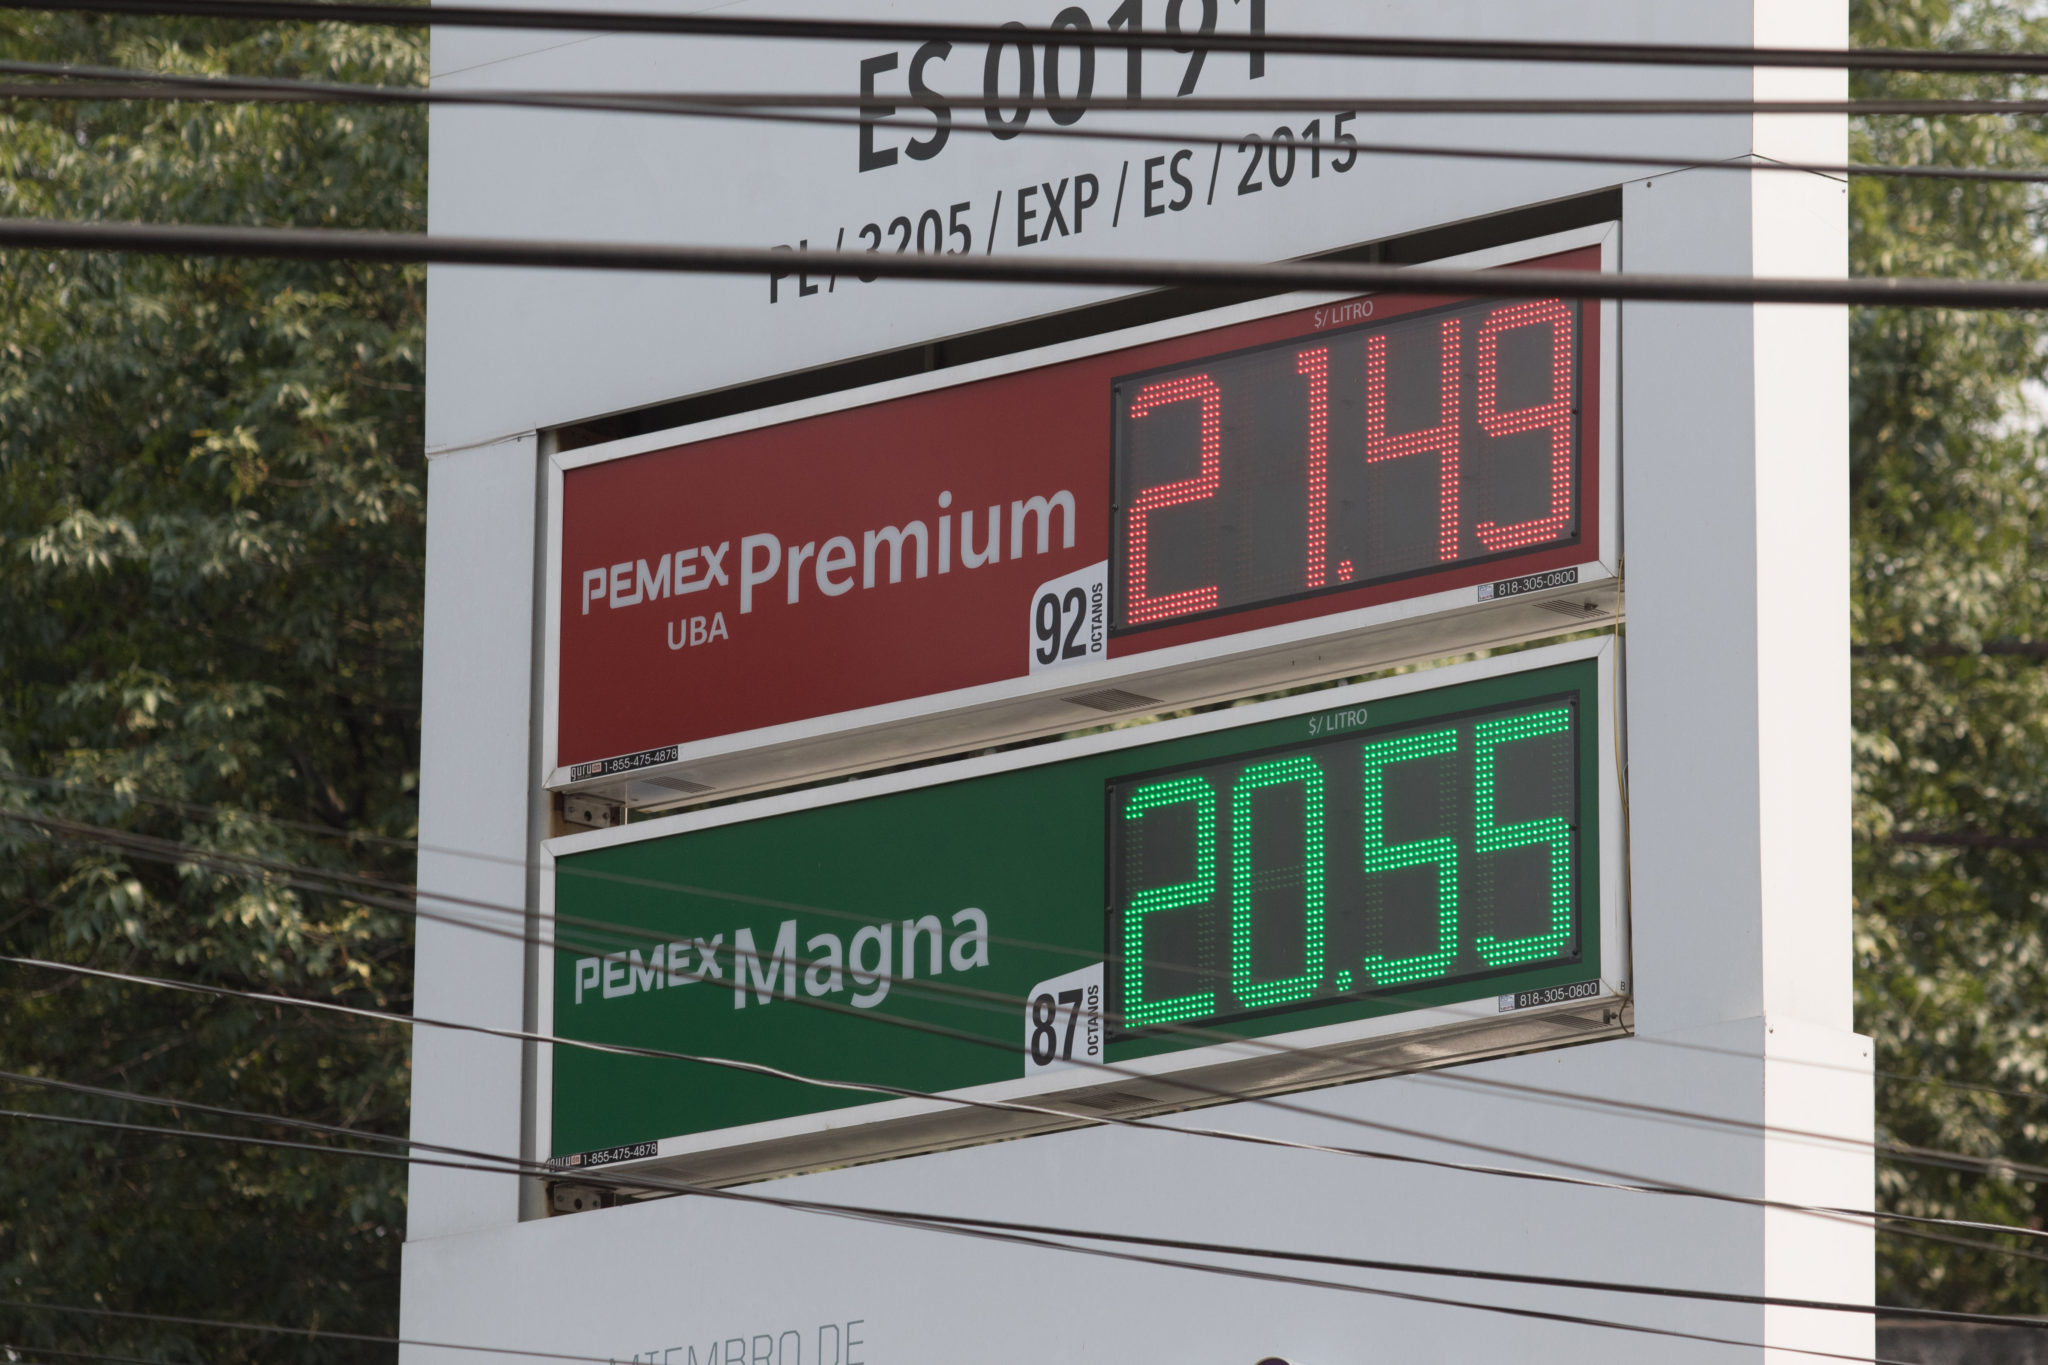 gasolinas, Pemex, Shell, Magna, Premium, Diesel, precios,